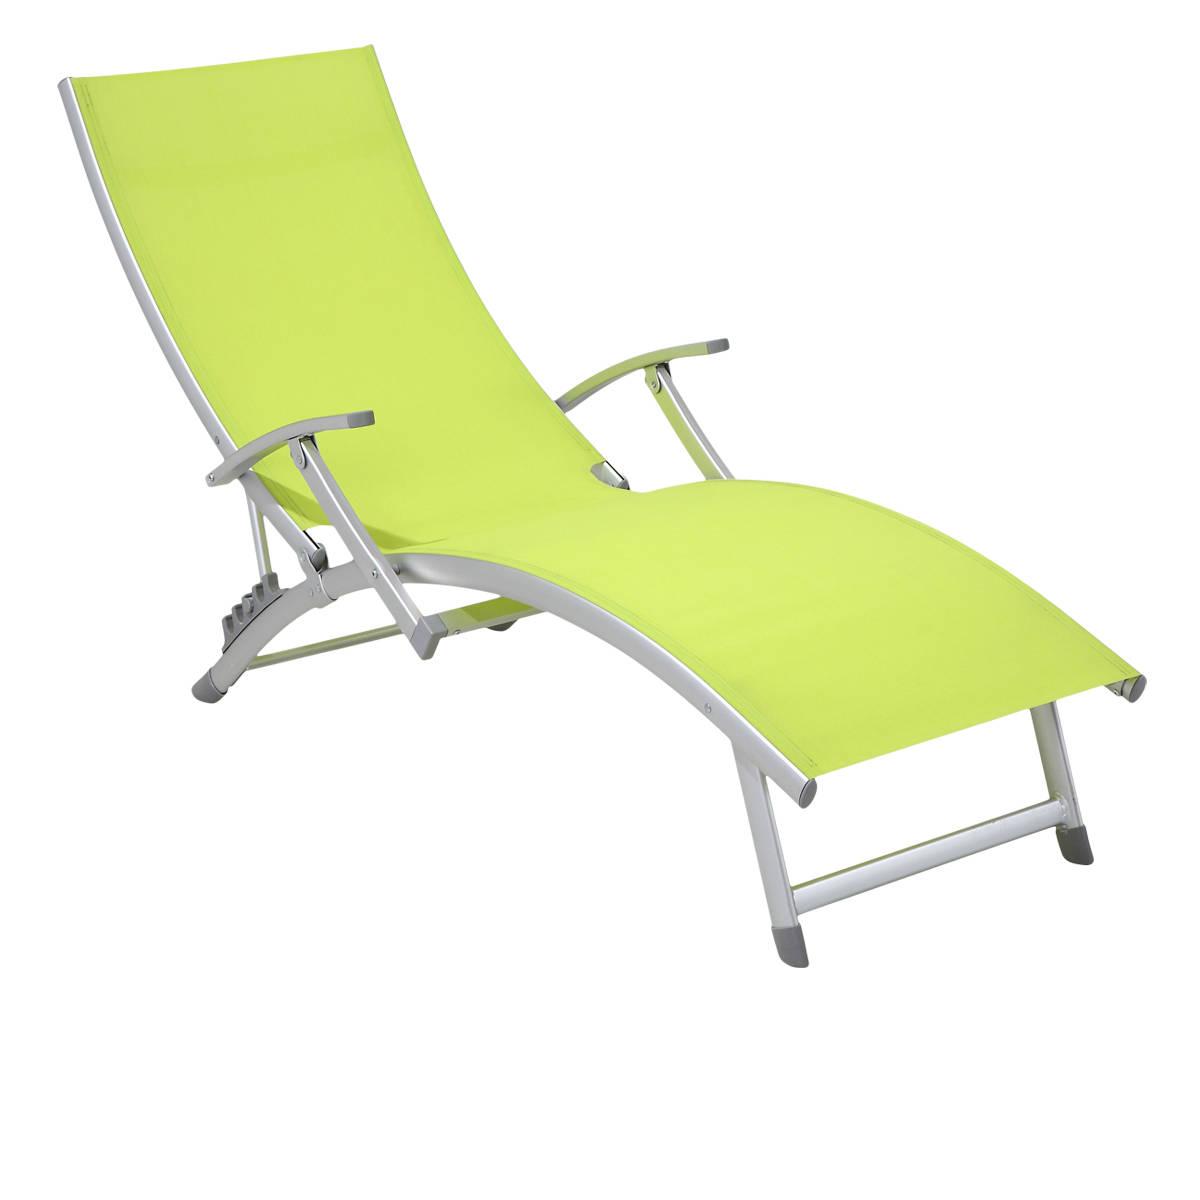 transat de jardin pas cher design en image. Black Bedroom Furniture Sets. Home Design Ideas